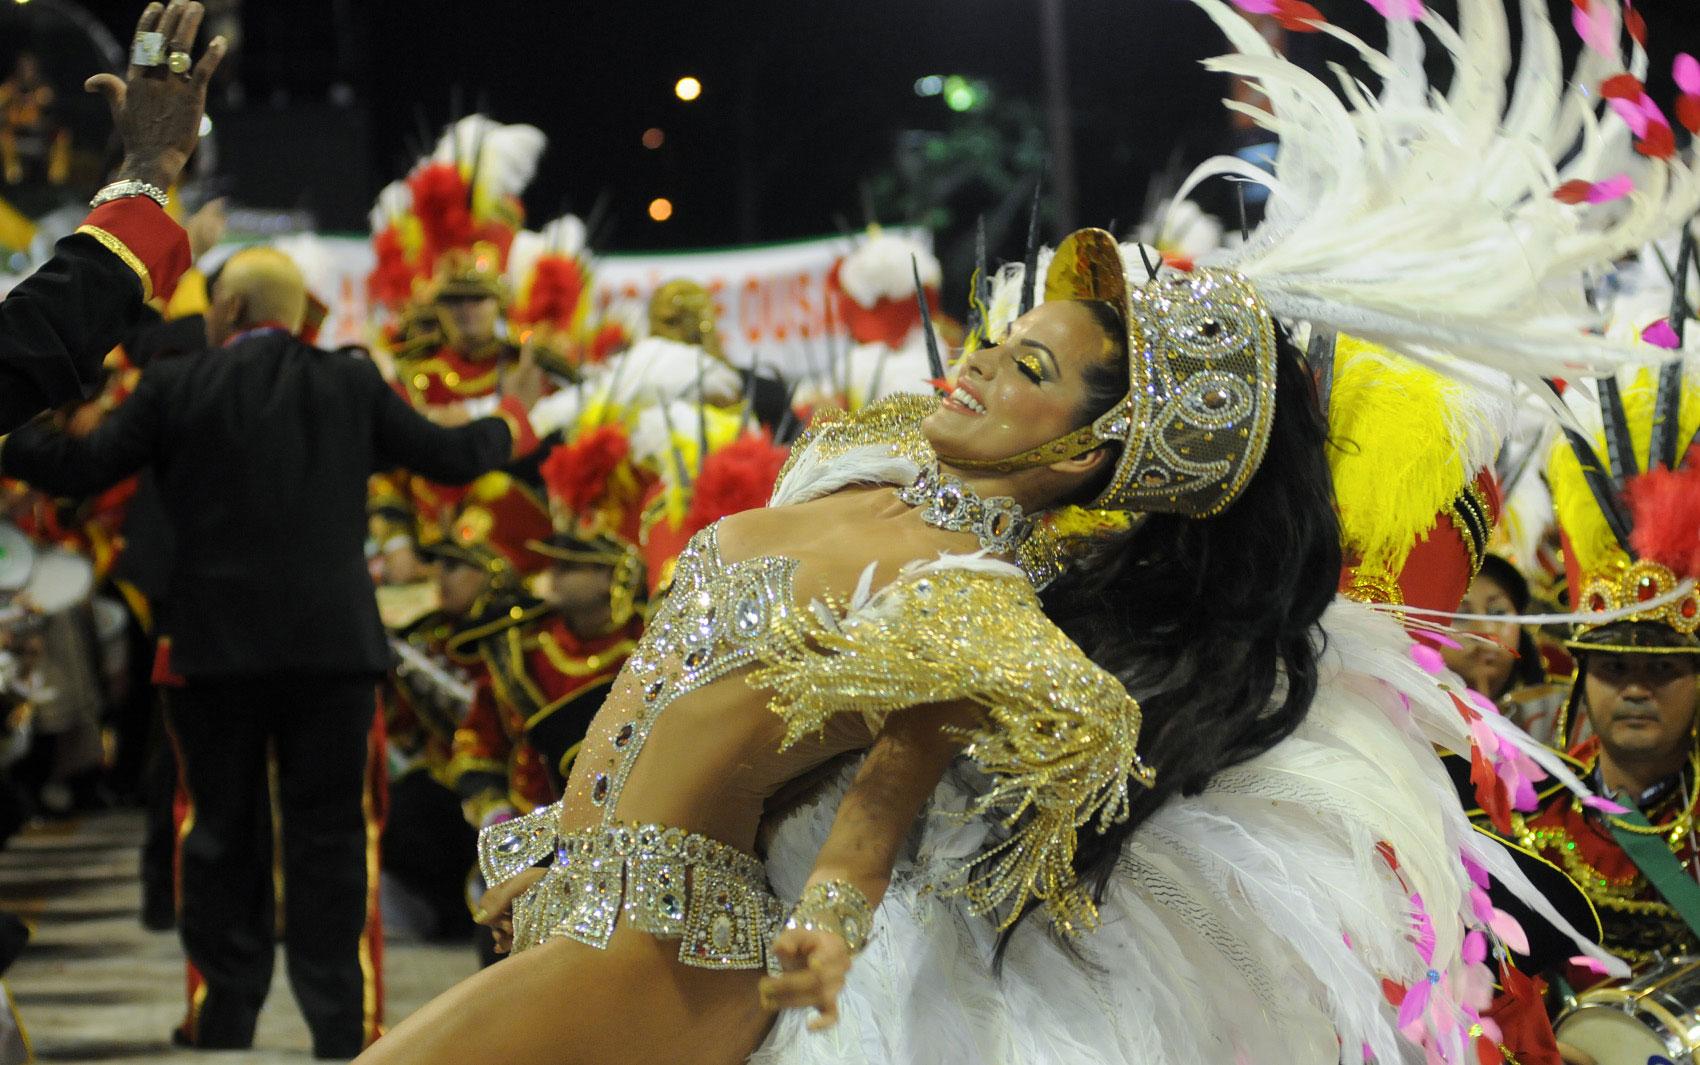 Carla Prata mostra desenvoltura no samba durante o desfile da Grande Rio na Sapucaí